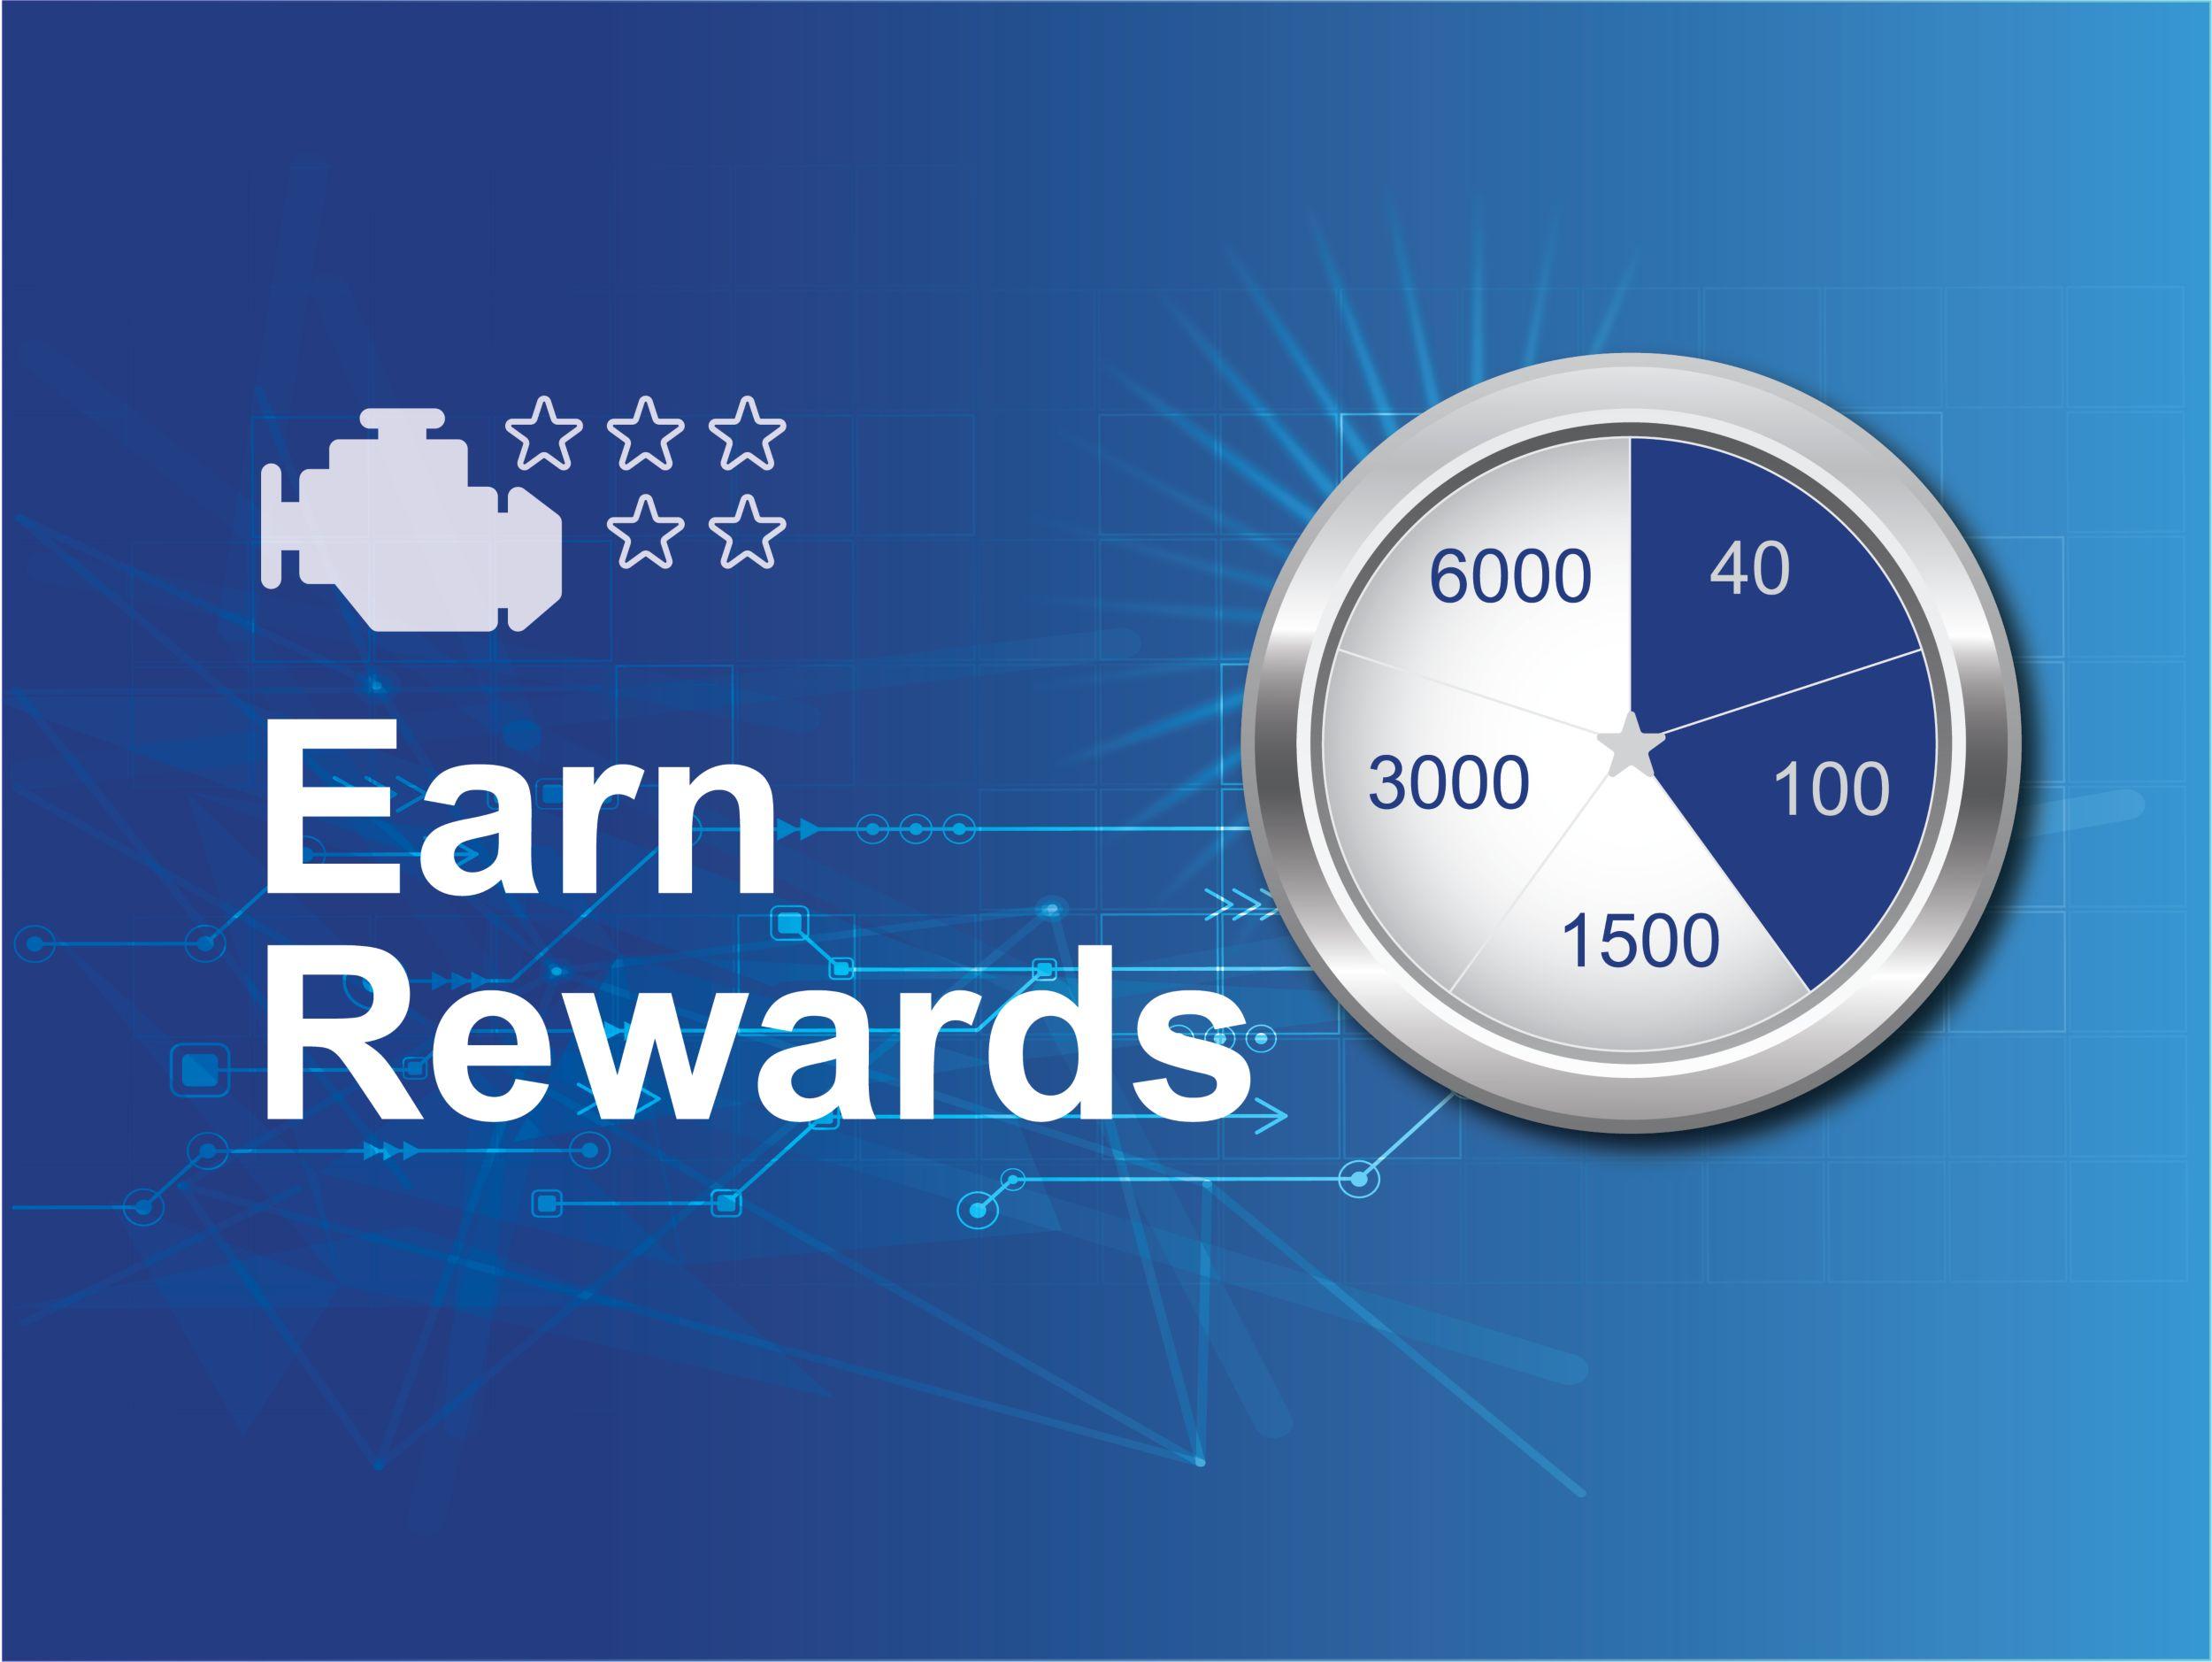 Perkins Engine Loyalty Programme